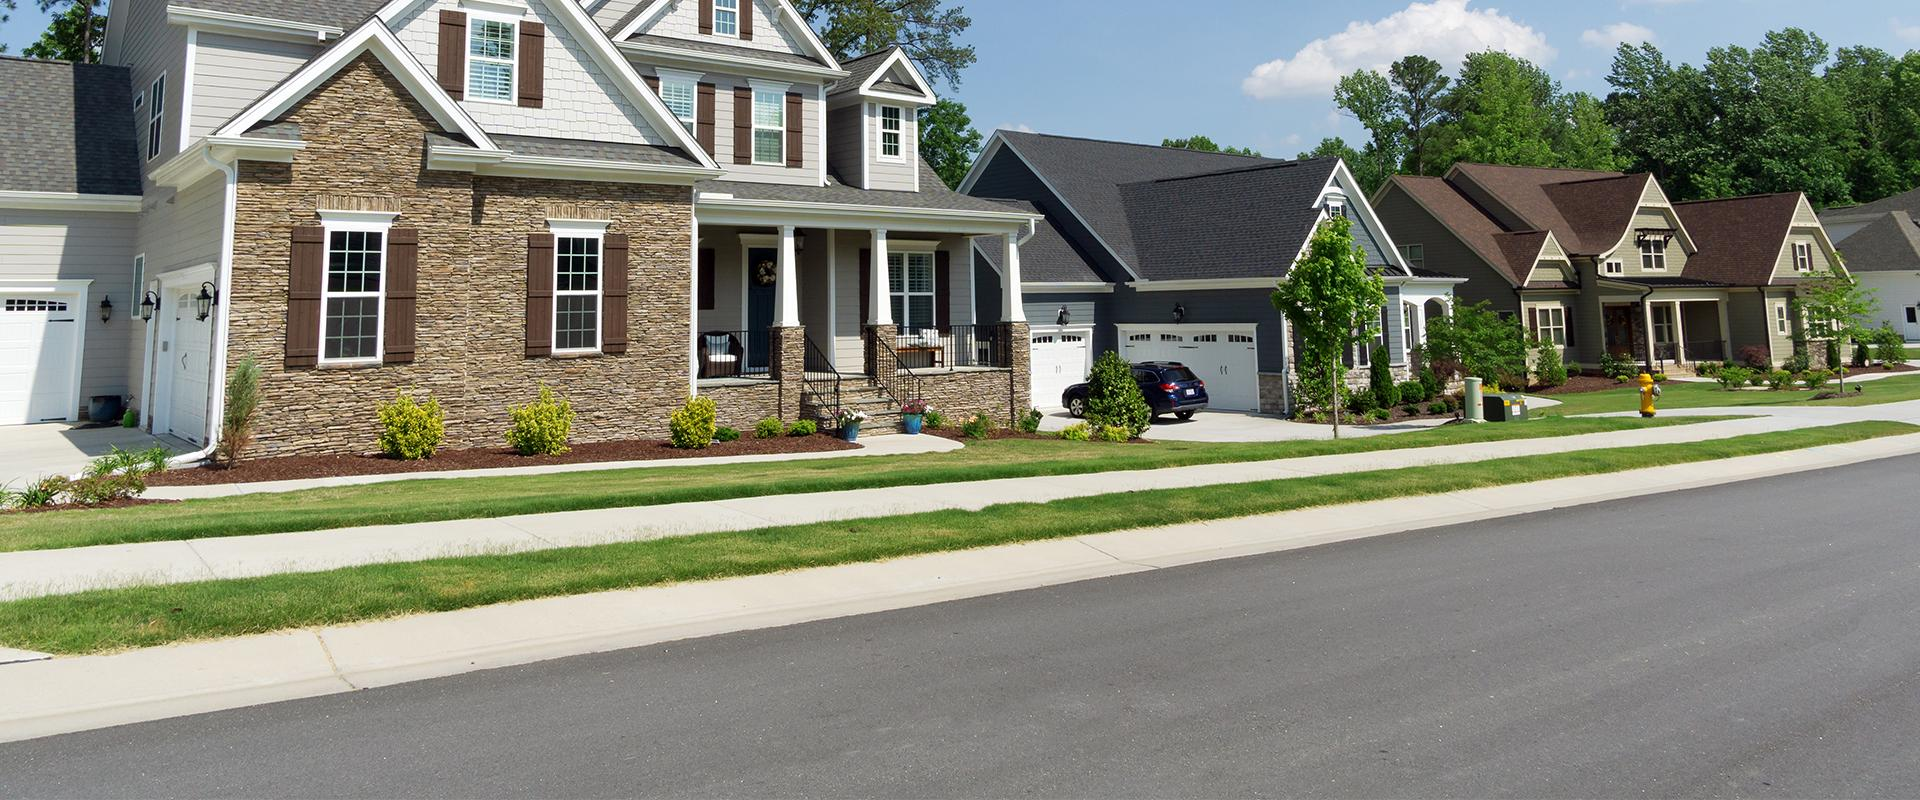 houses along a street in oklahoma city